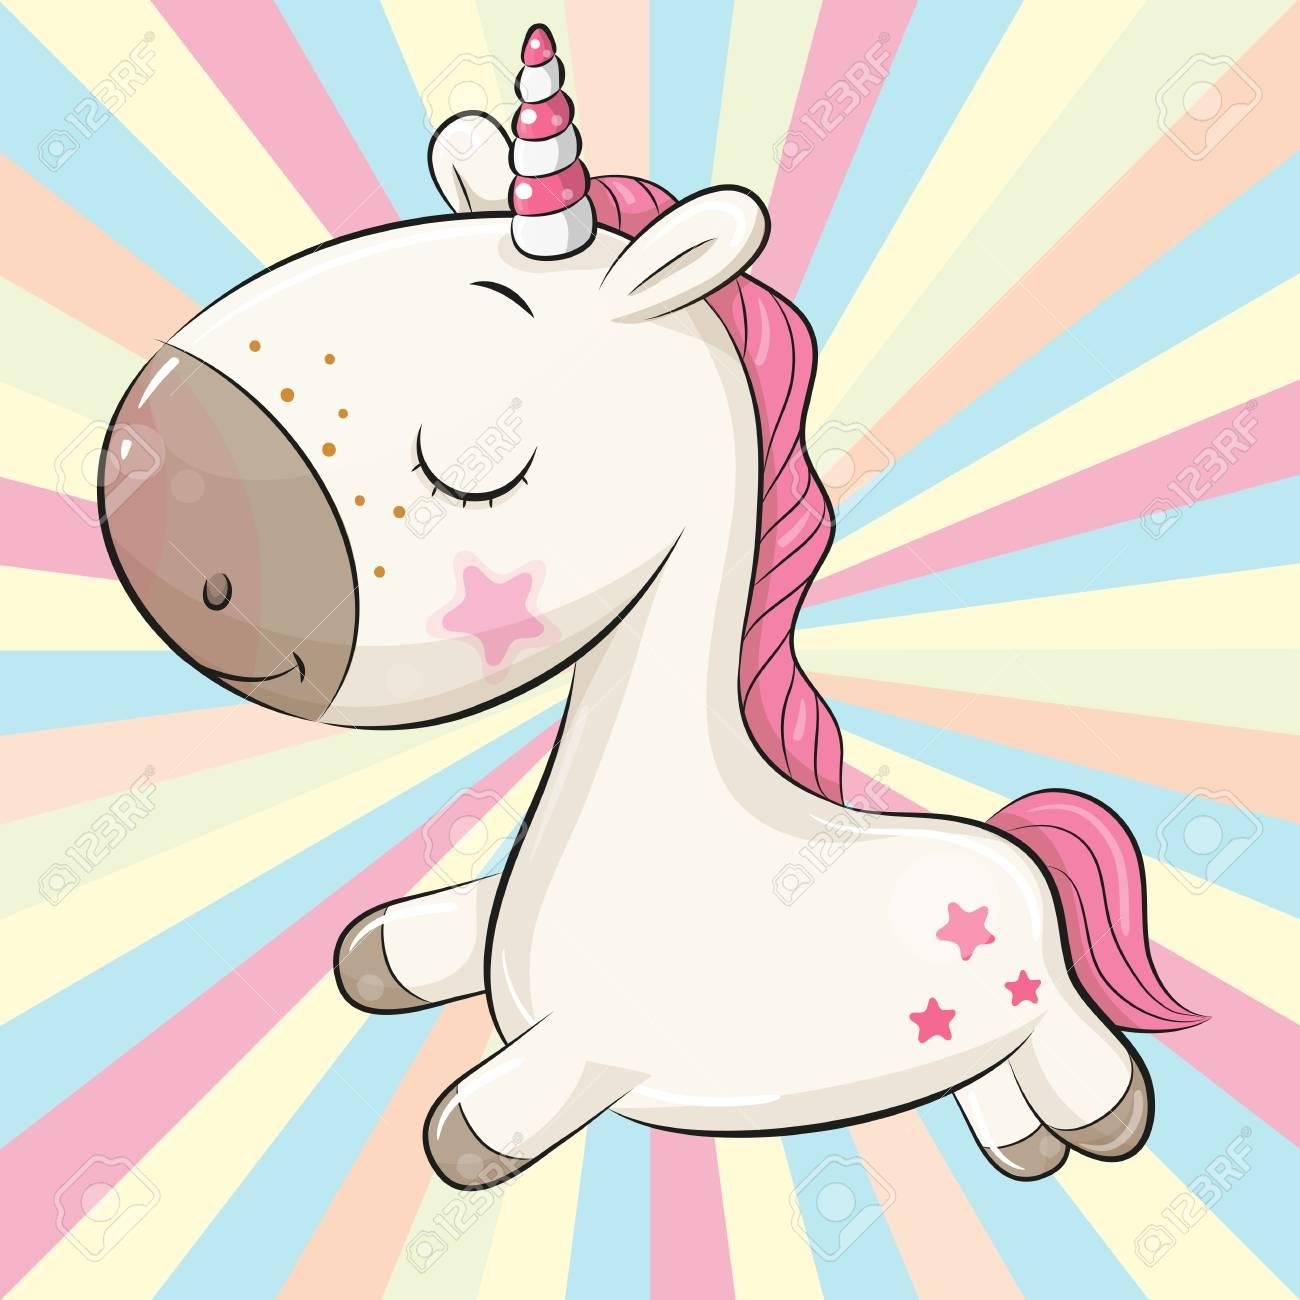 Cartoon Unicorn on a colored background - 111653747